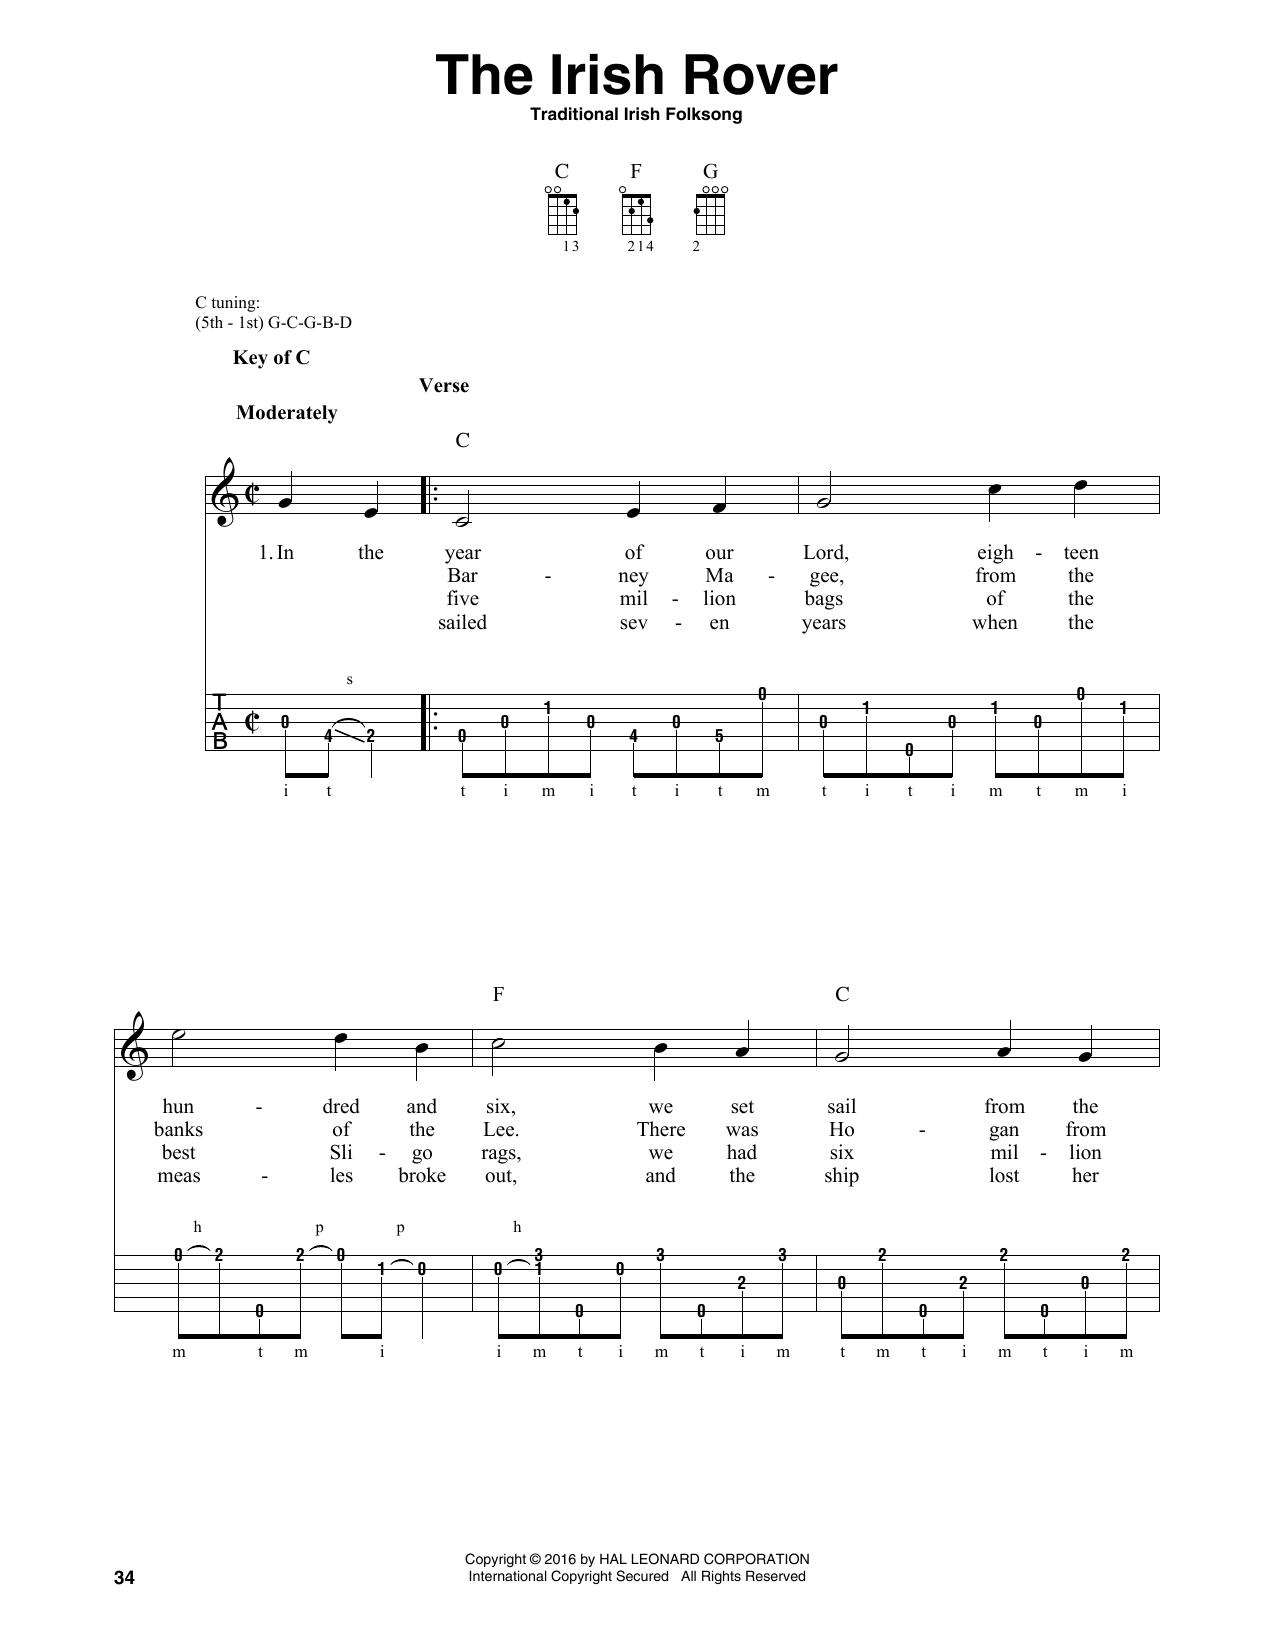 Traditional Irish Folk Song The Irish Rover sheet music notes and chords